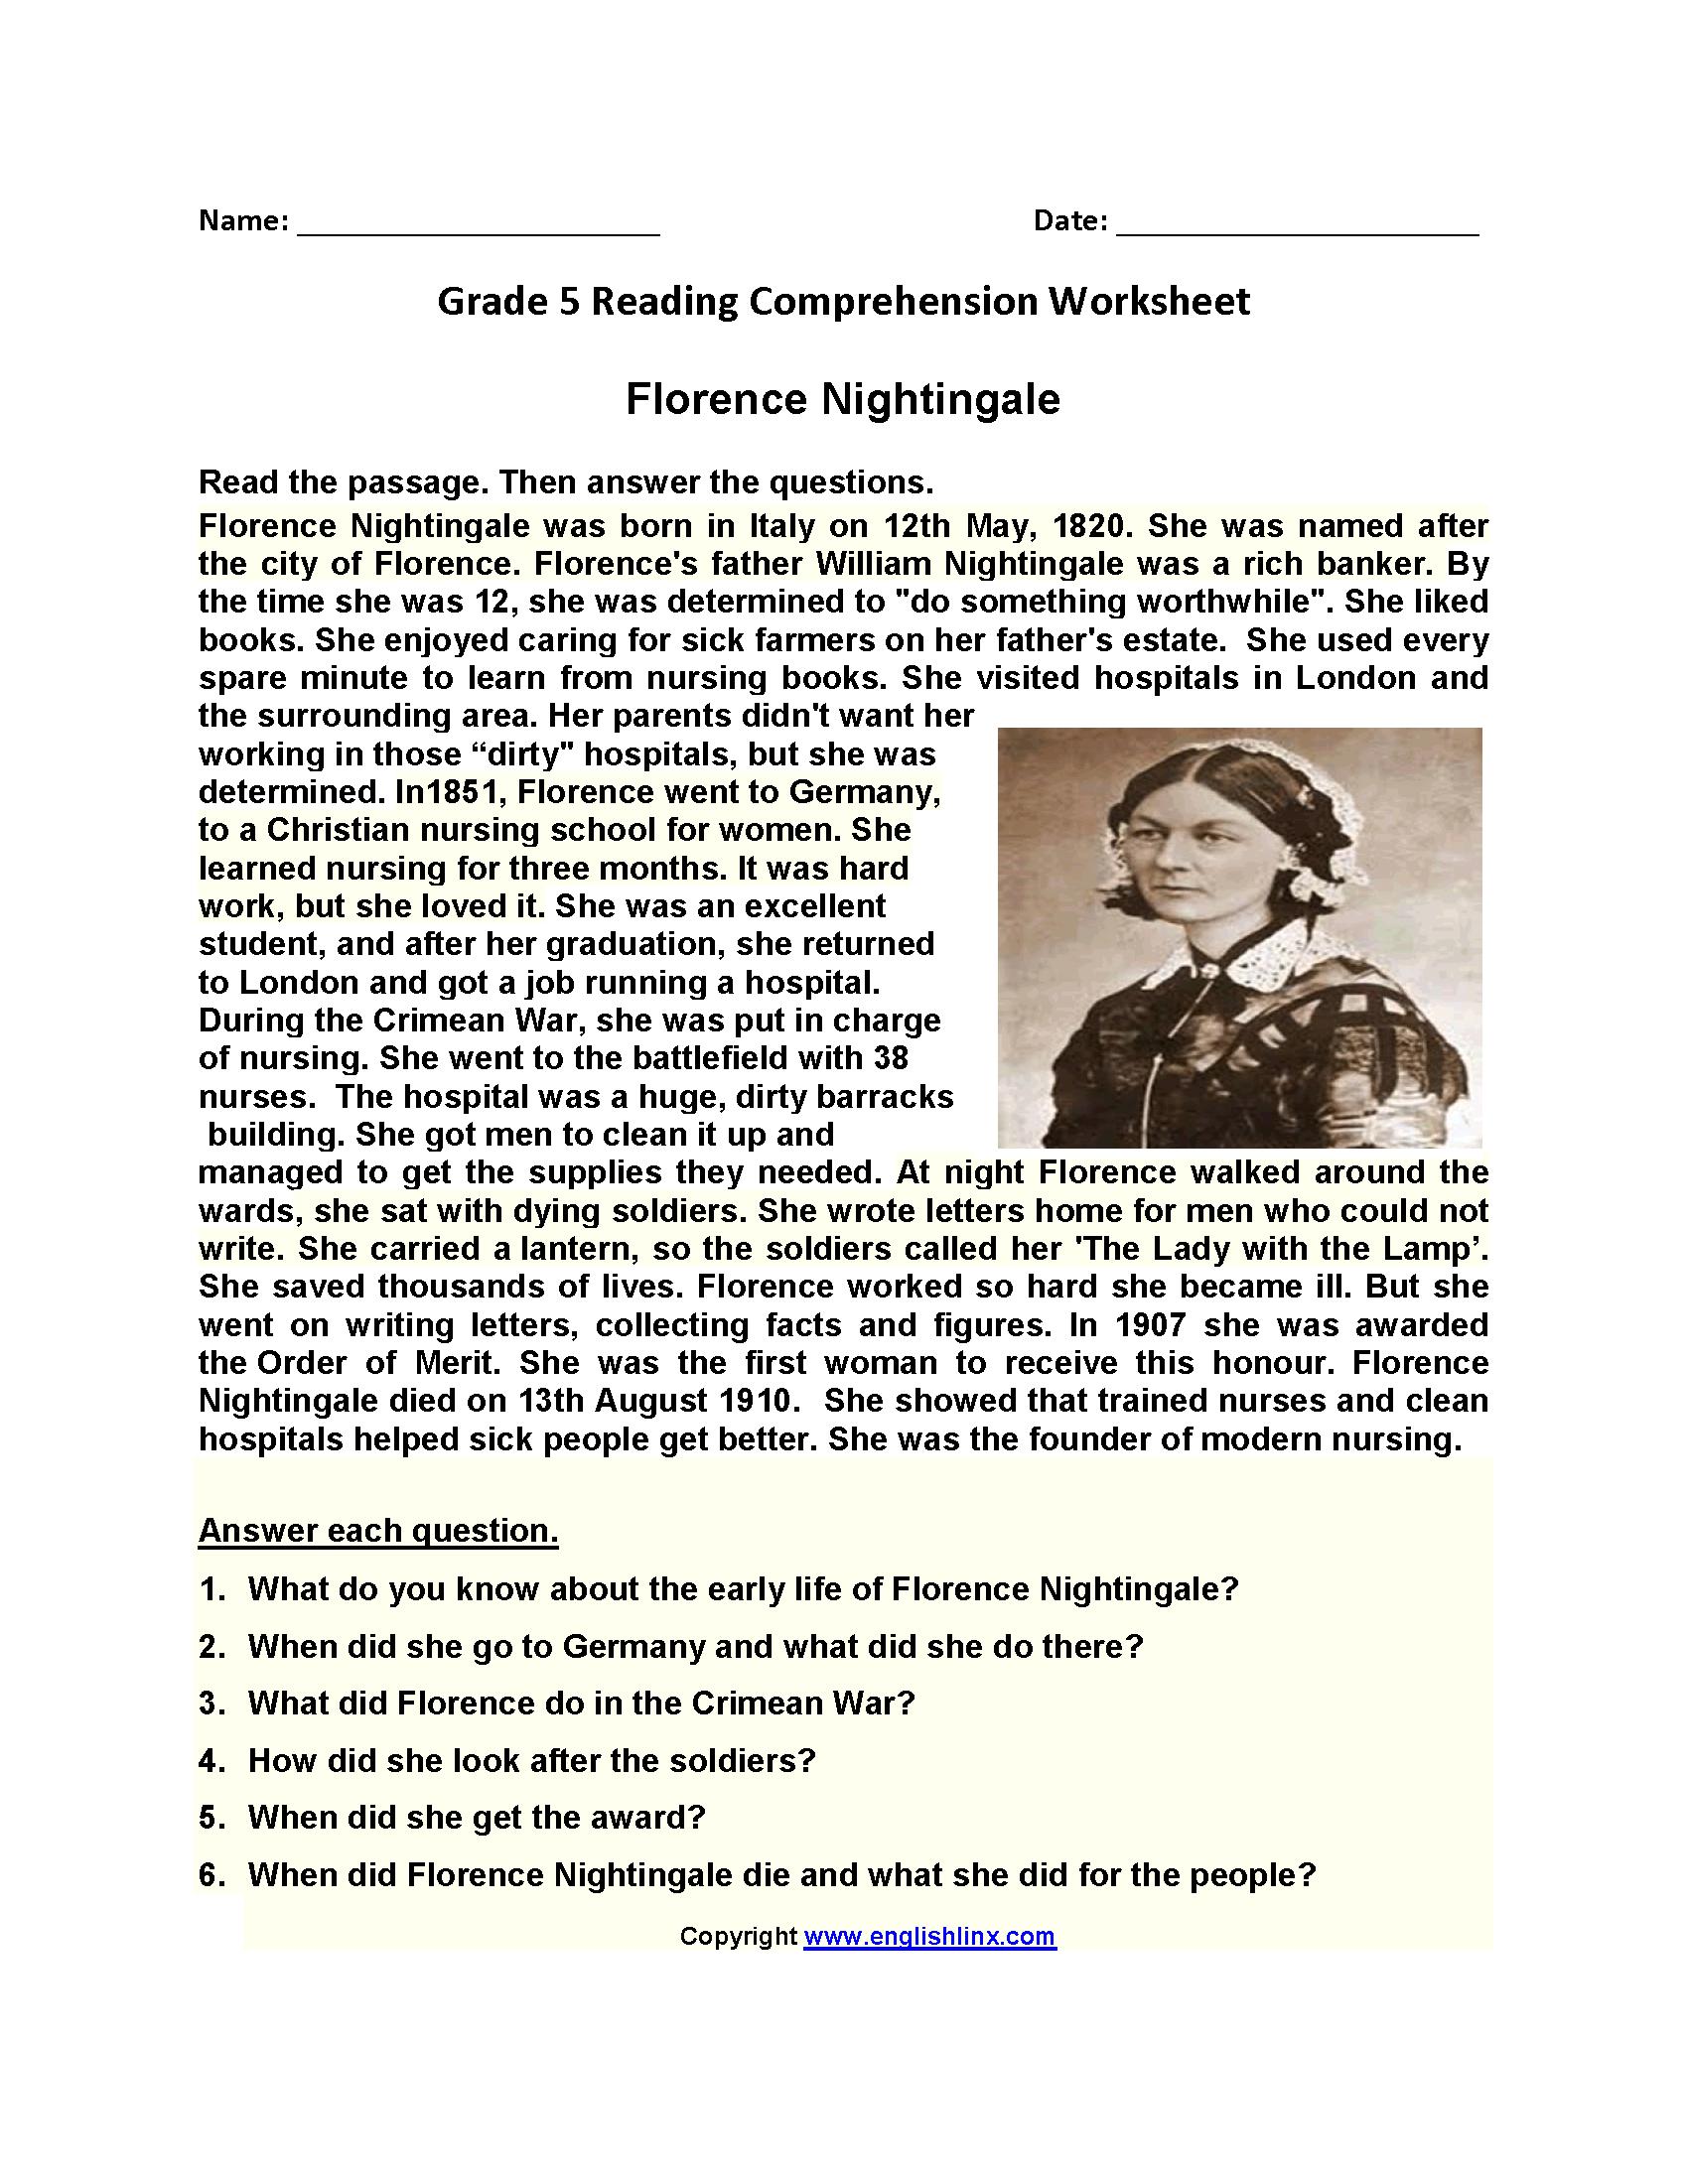 Reading Worksheets | Fifth Grade Reading Worksheets - Free Printable Worksheets Reading Comprehension 5Th Grade